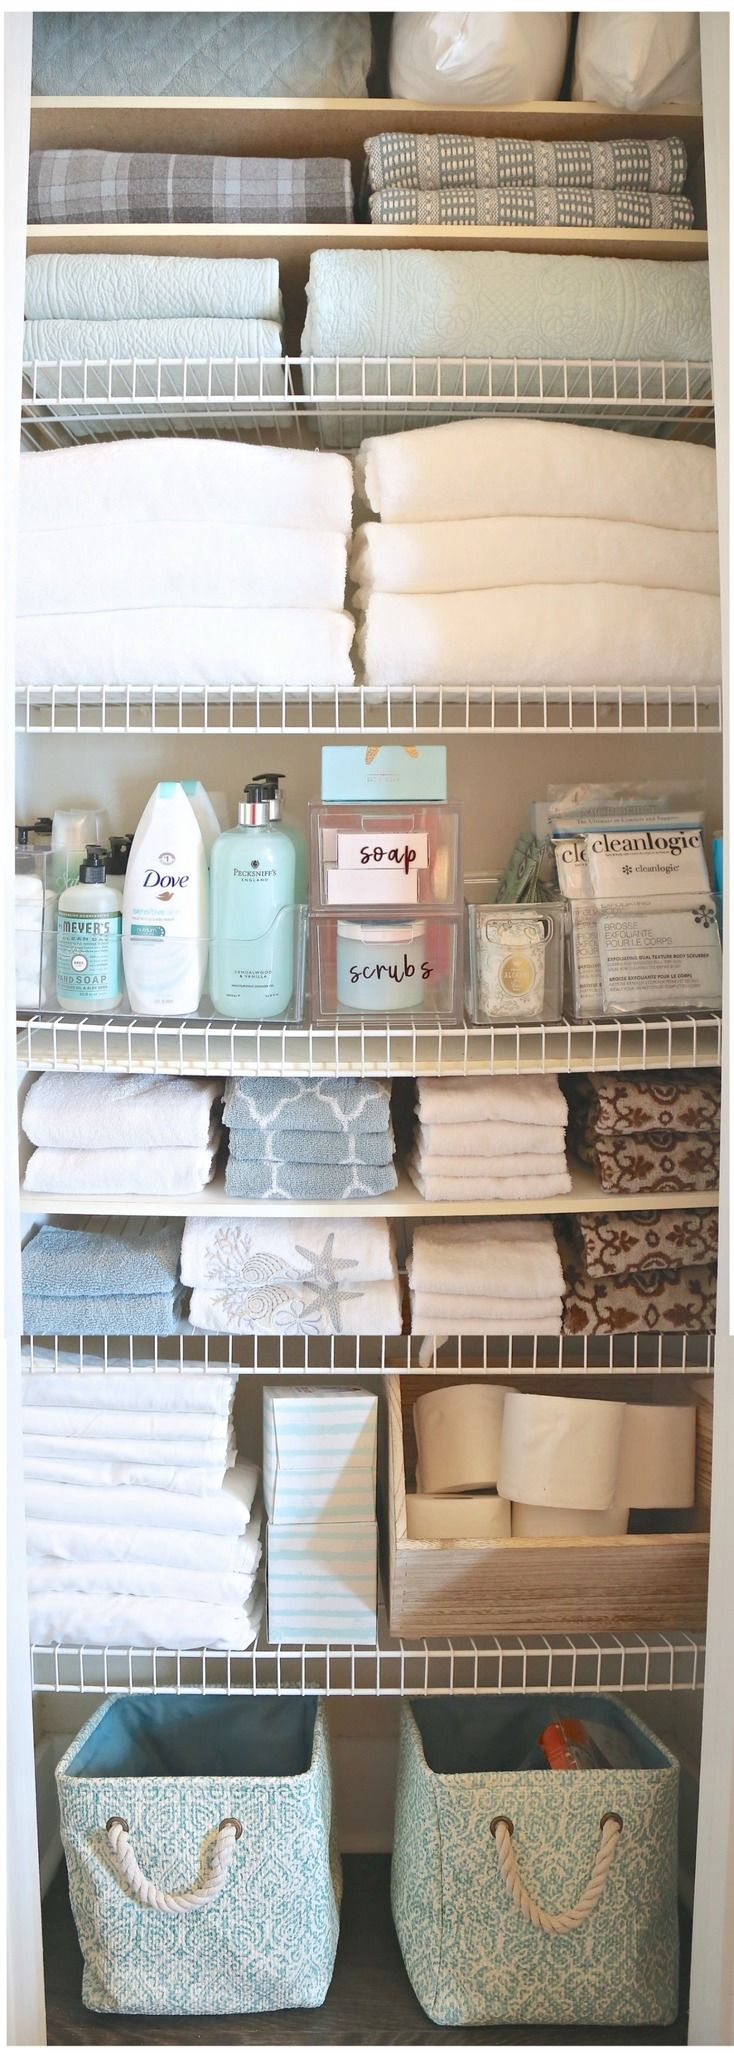 Linen Closet Organizing Create More Storage